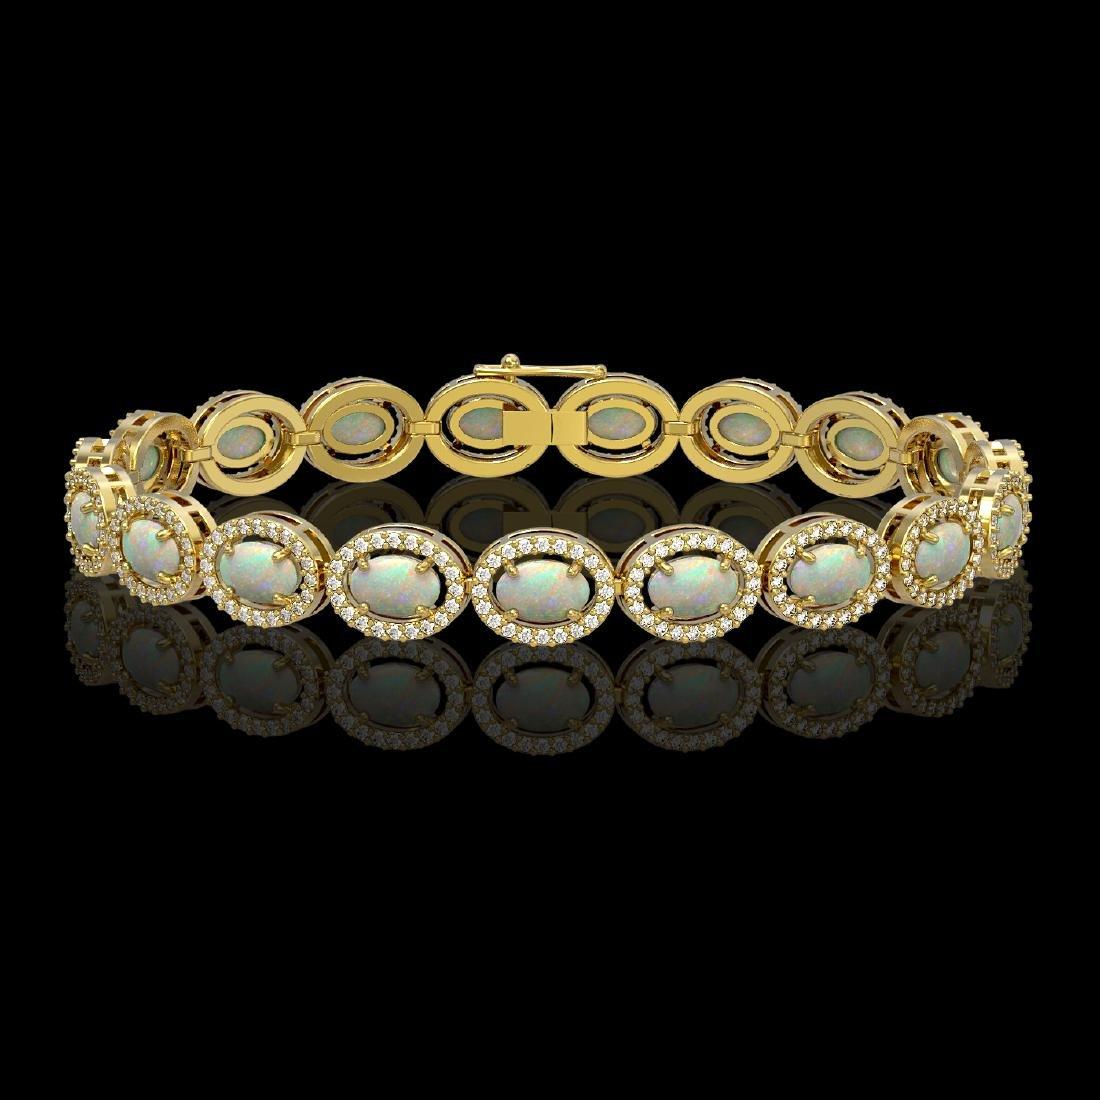 9.5 CTW Opal & Diamond Halo Bracelet 10K Yellow Gold